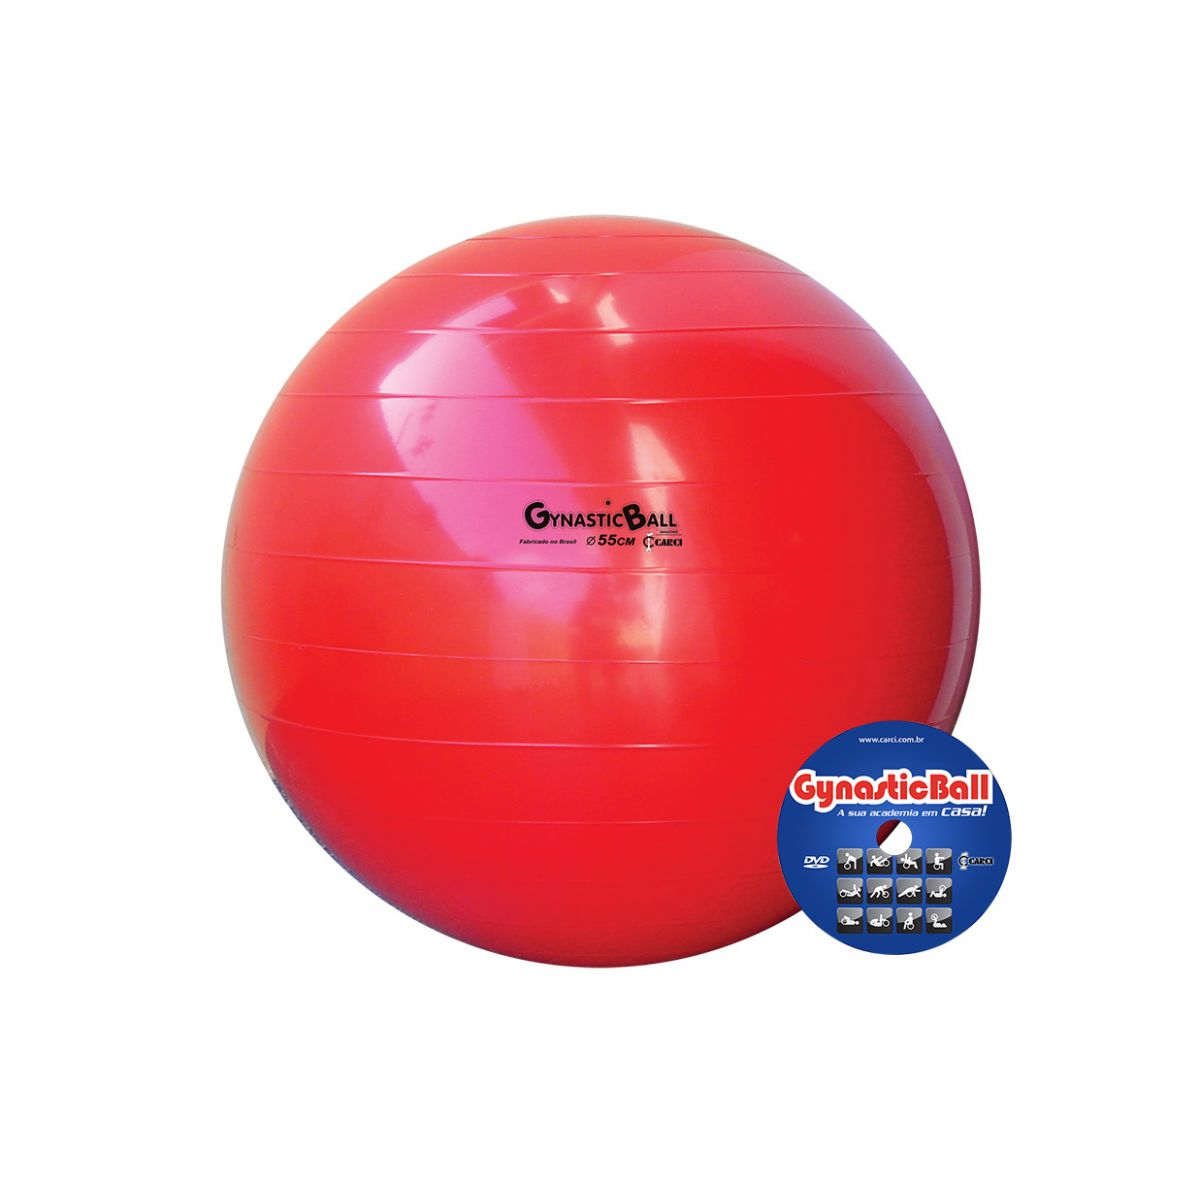 Bola suíça para pilates 55cm Gynastic Ball - vermelha - BL.01.55 - Loja  Carci b717c4326928f